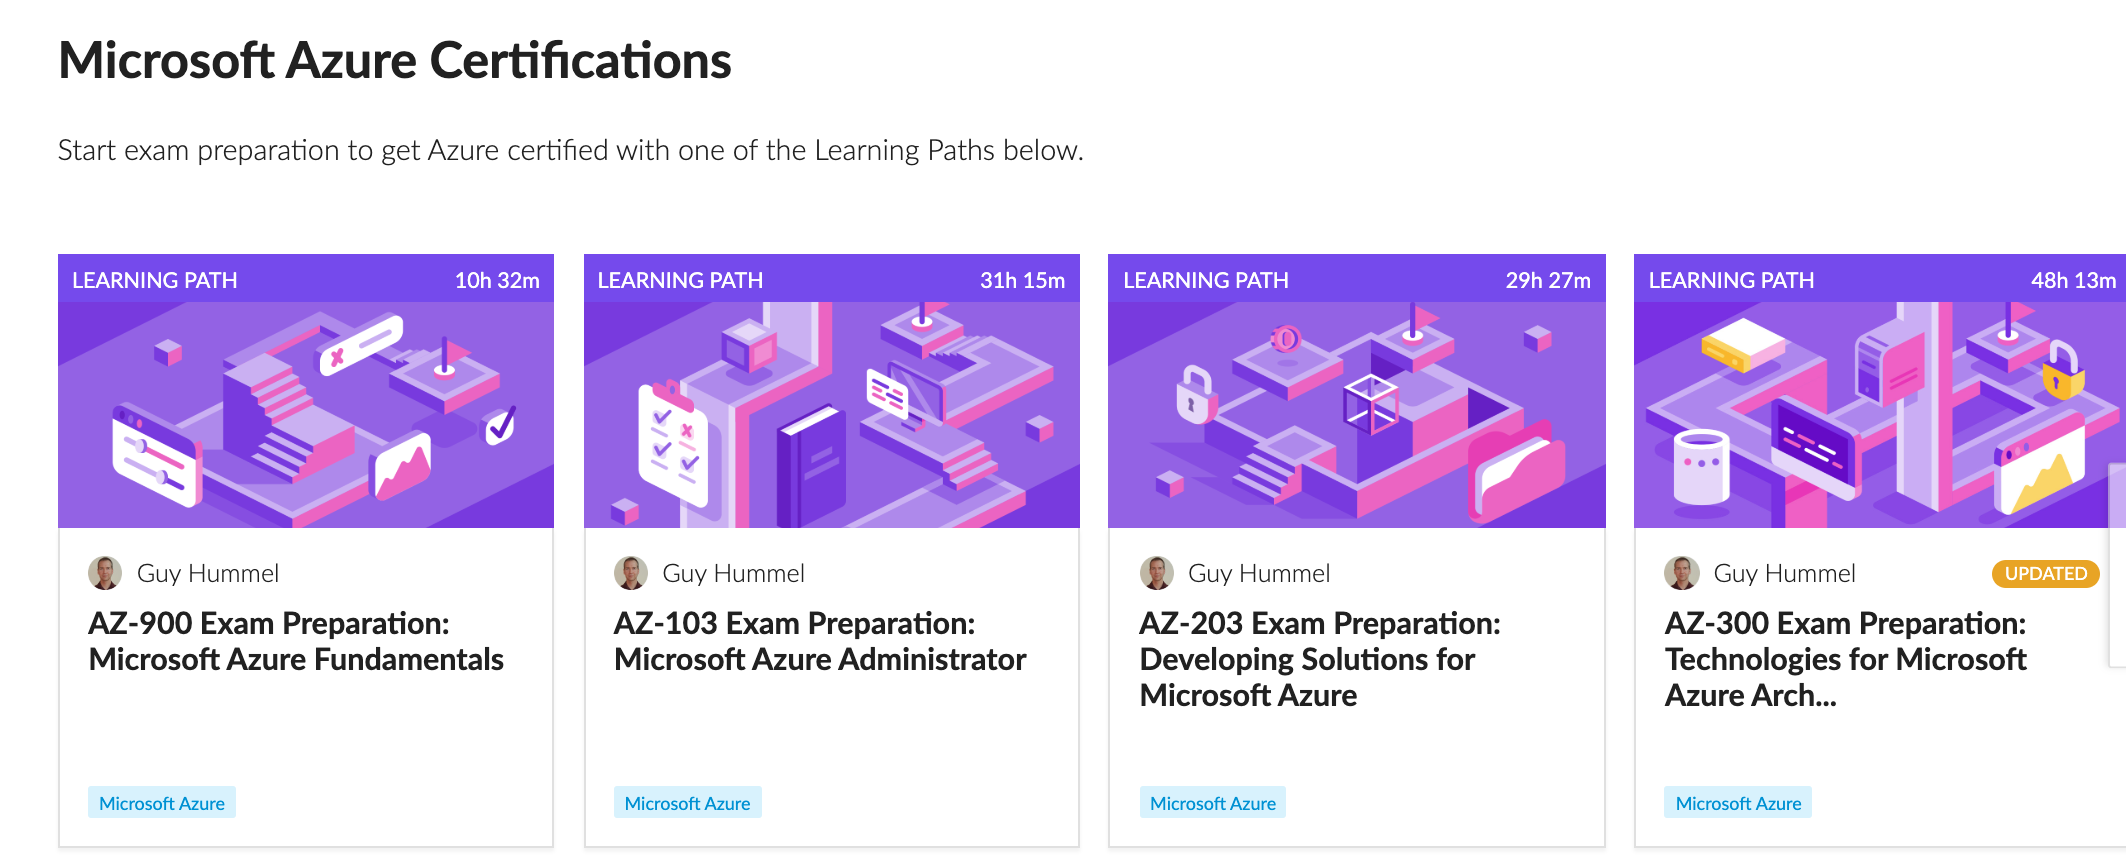 Microsoft Azure Certifications